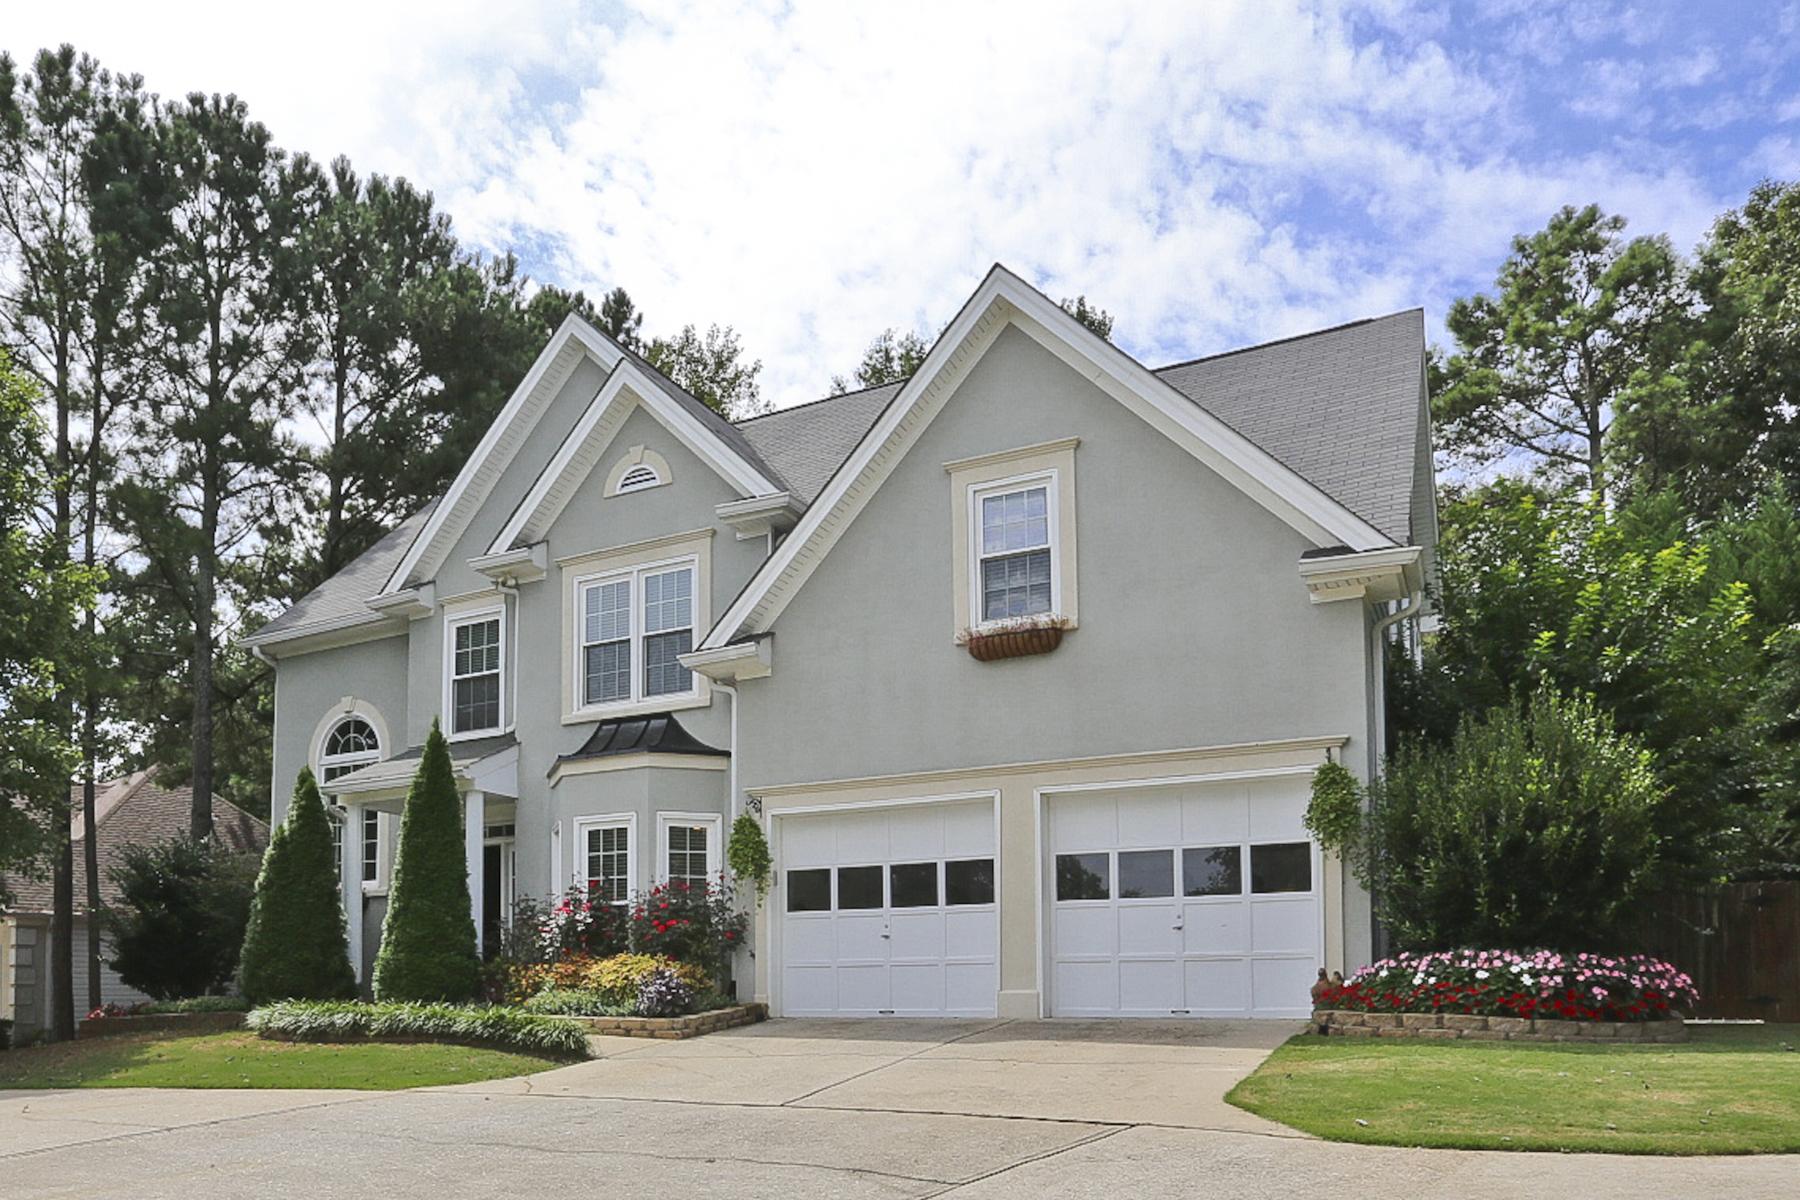 Villa per Vendita alle ore Charming Curb Appeal In Desirable South Forsyth Neighborhood 5505 Kennemore Drive Alpharetta, Georgia 30004 Stati Uniti